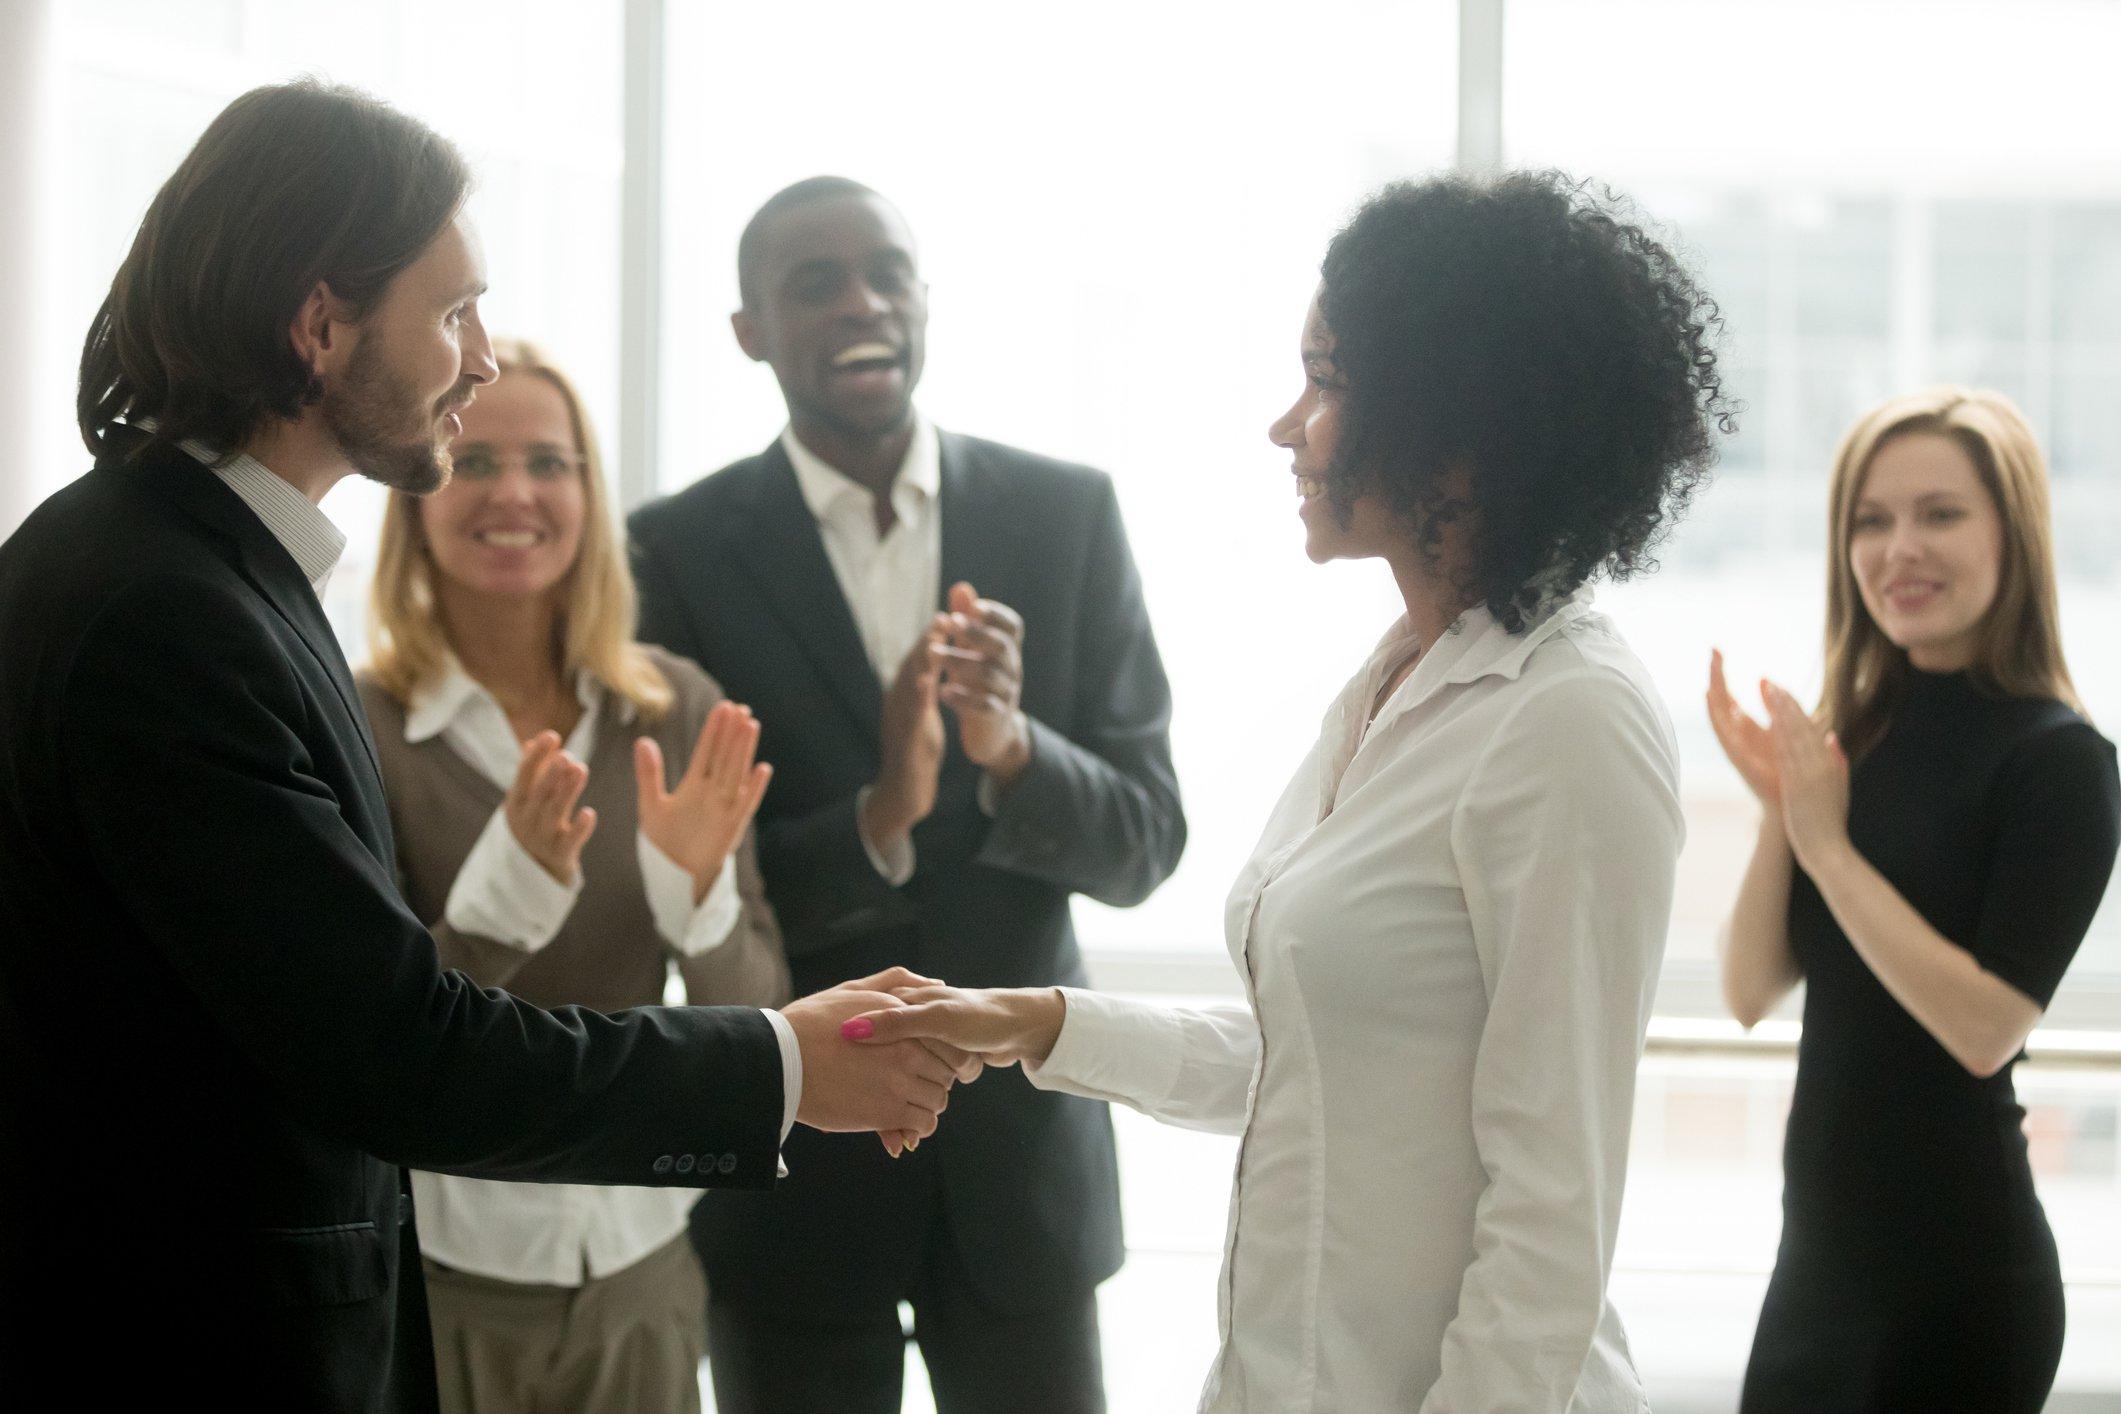 6 Employee Appreciation Ideas to Keep Employees Happy